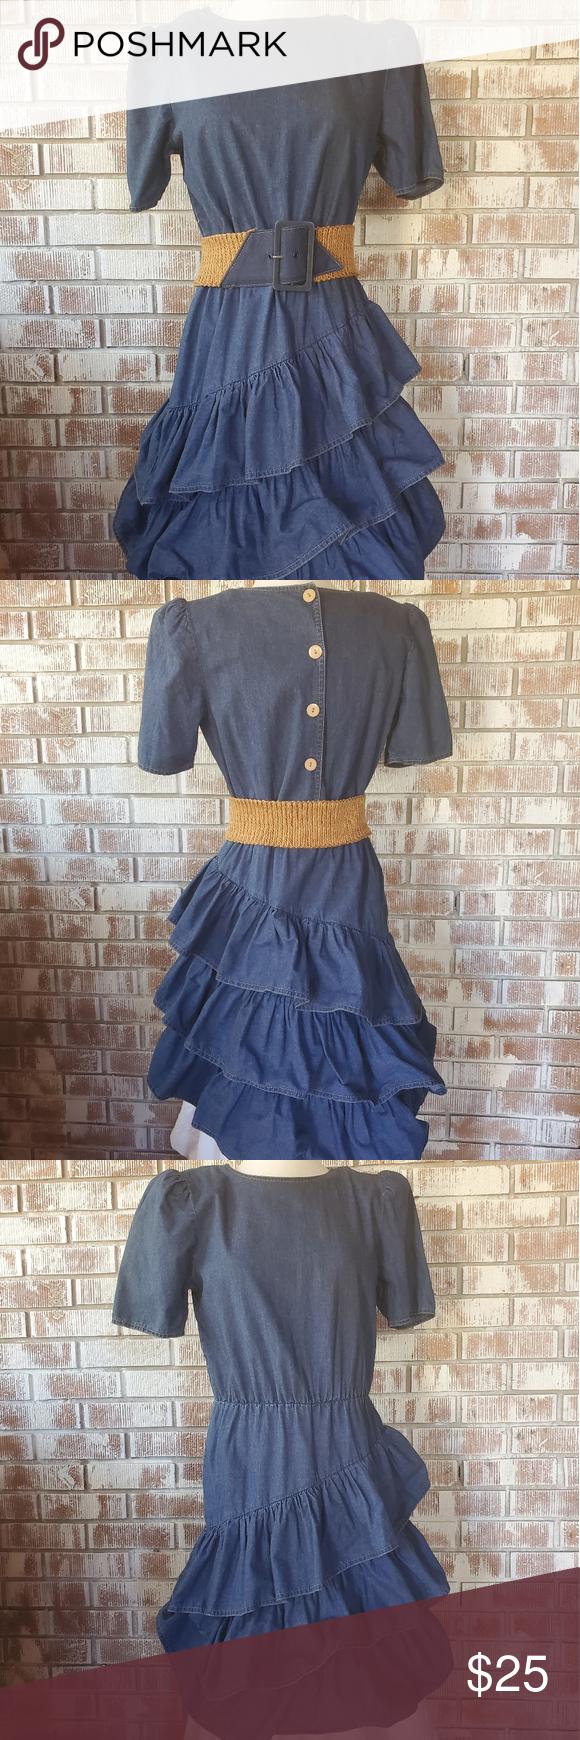 Vintage Denim Ruffle Dress Denim Ruffle Dress Vintage Denim Ruffle Dress [ 1740 x 580 Pixel ]